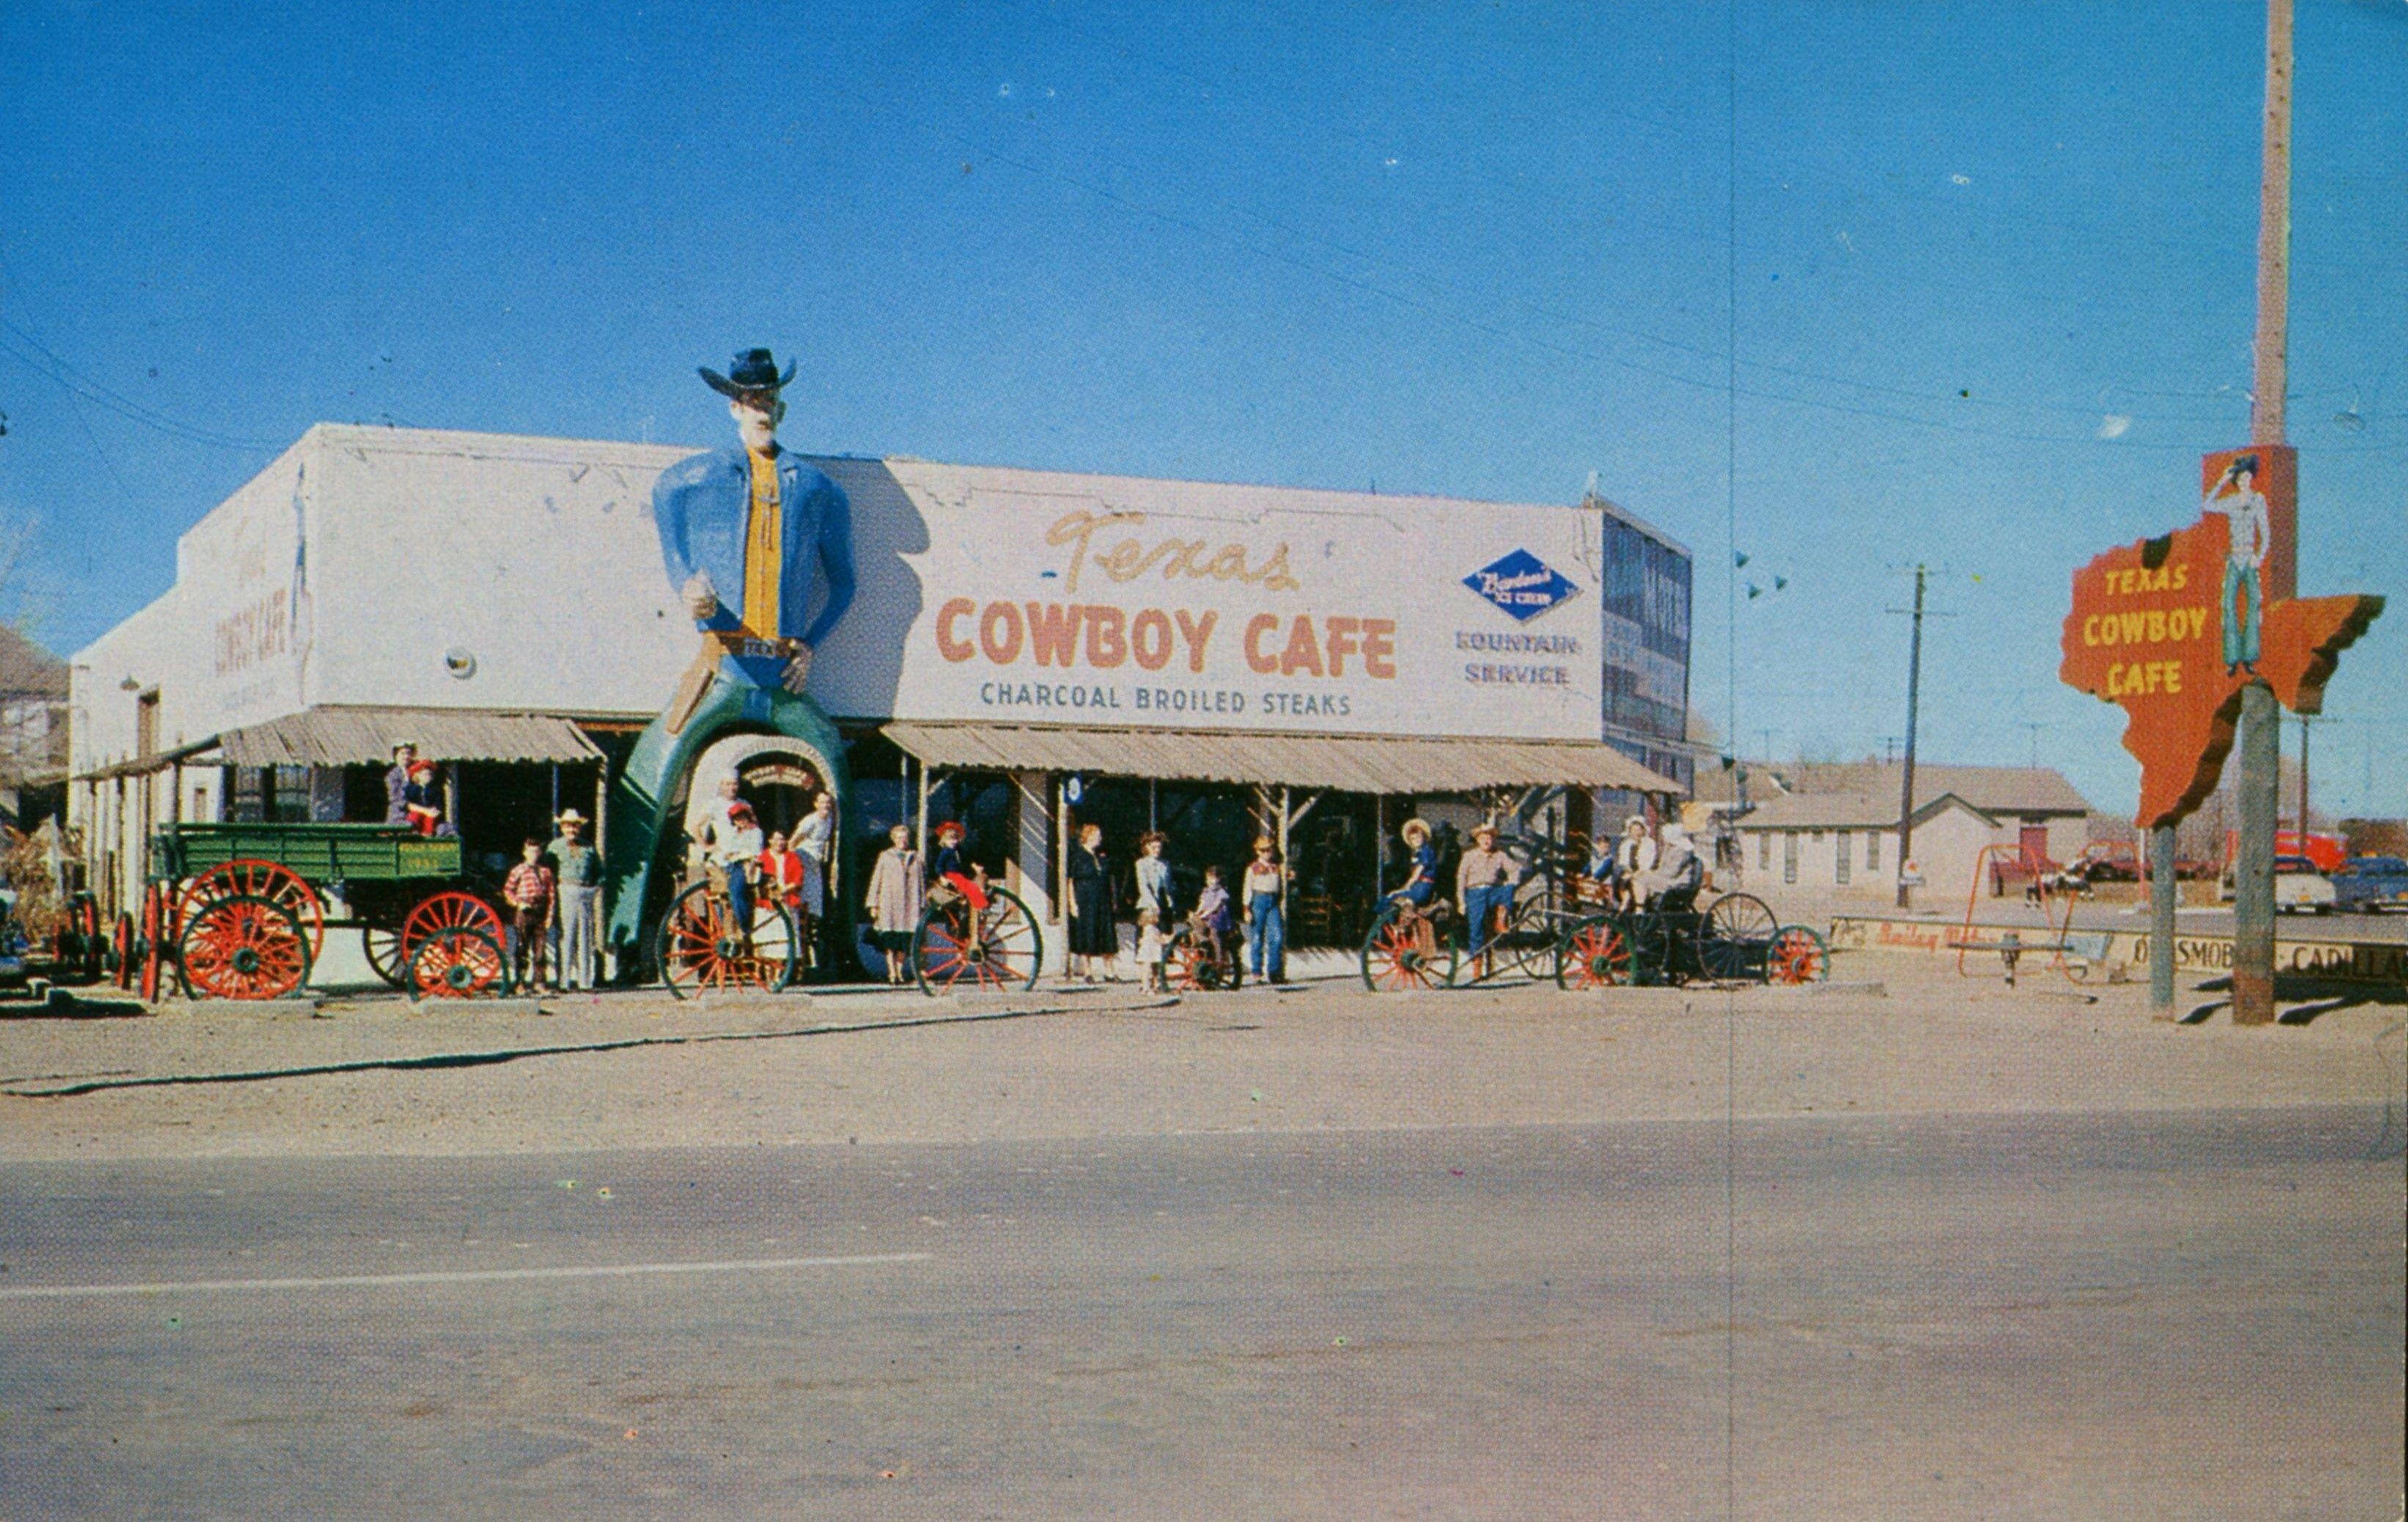 Cowboy Cafe Dalhart Texas 9224402519 O Postcards Collectables Vintage Retro Photos Art Cowboy Cafe Postcard Roadside Attractions